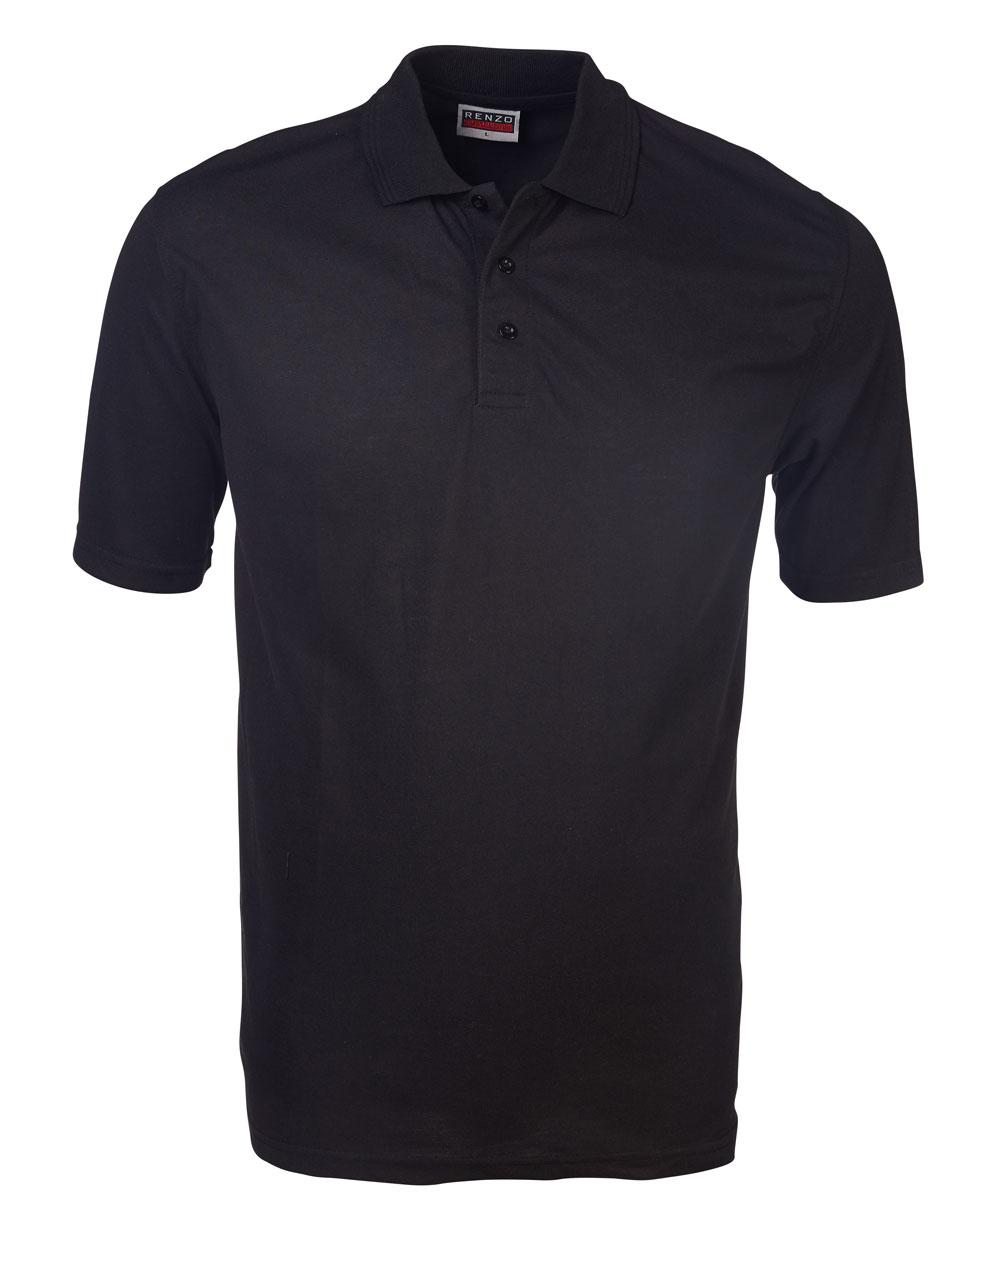 P18 Pique Golfer - Black